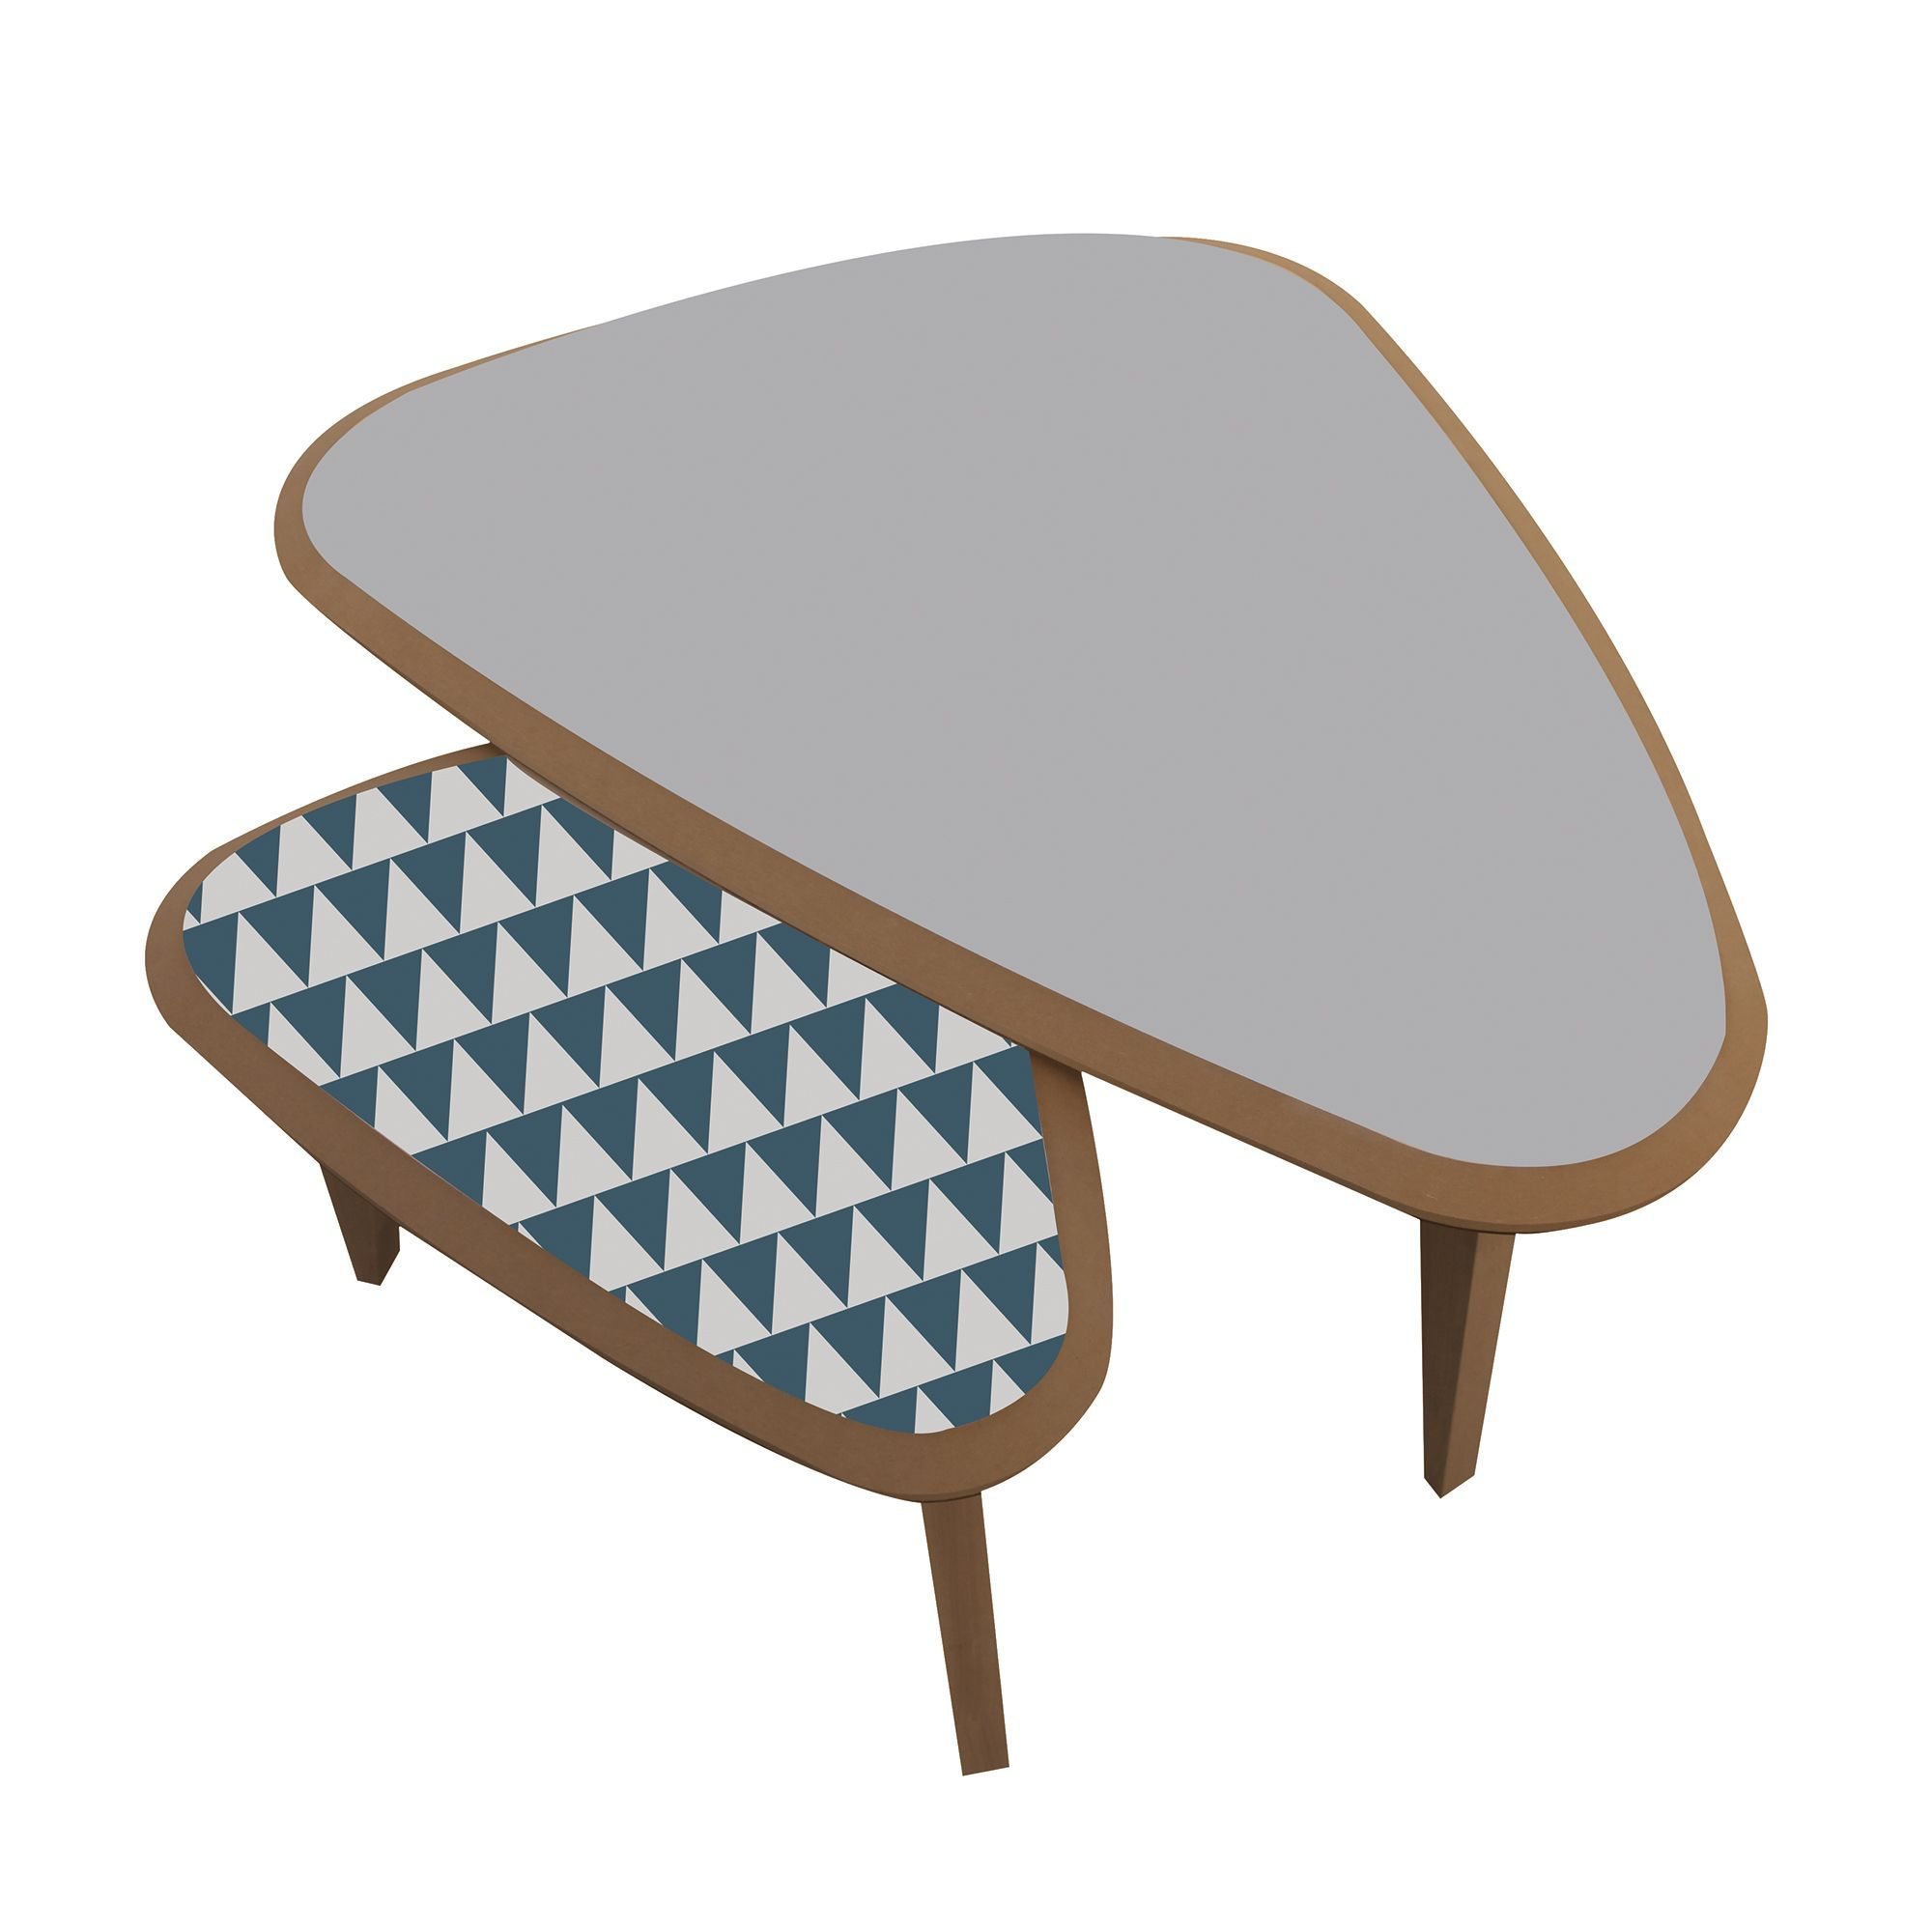 Table basse alinea grise